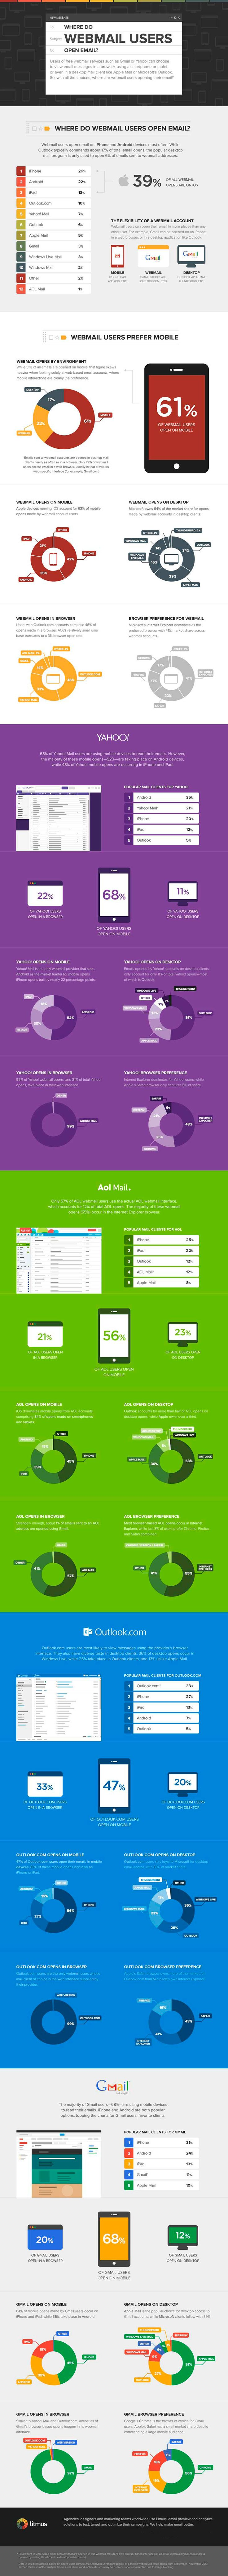 email marketing herramienta fundamental en movil